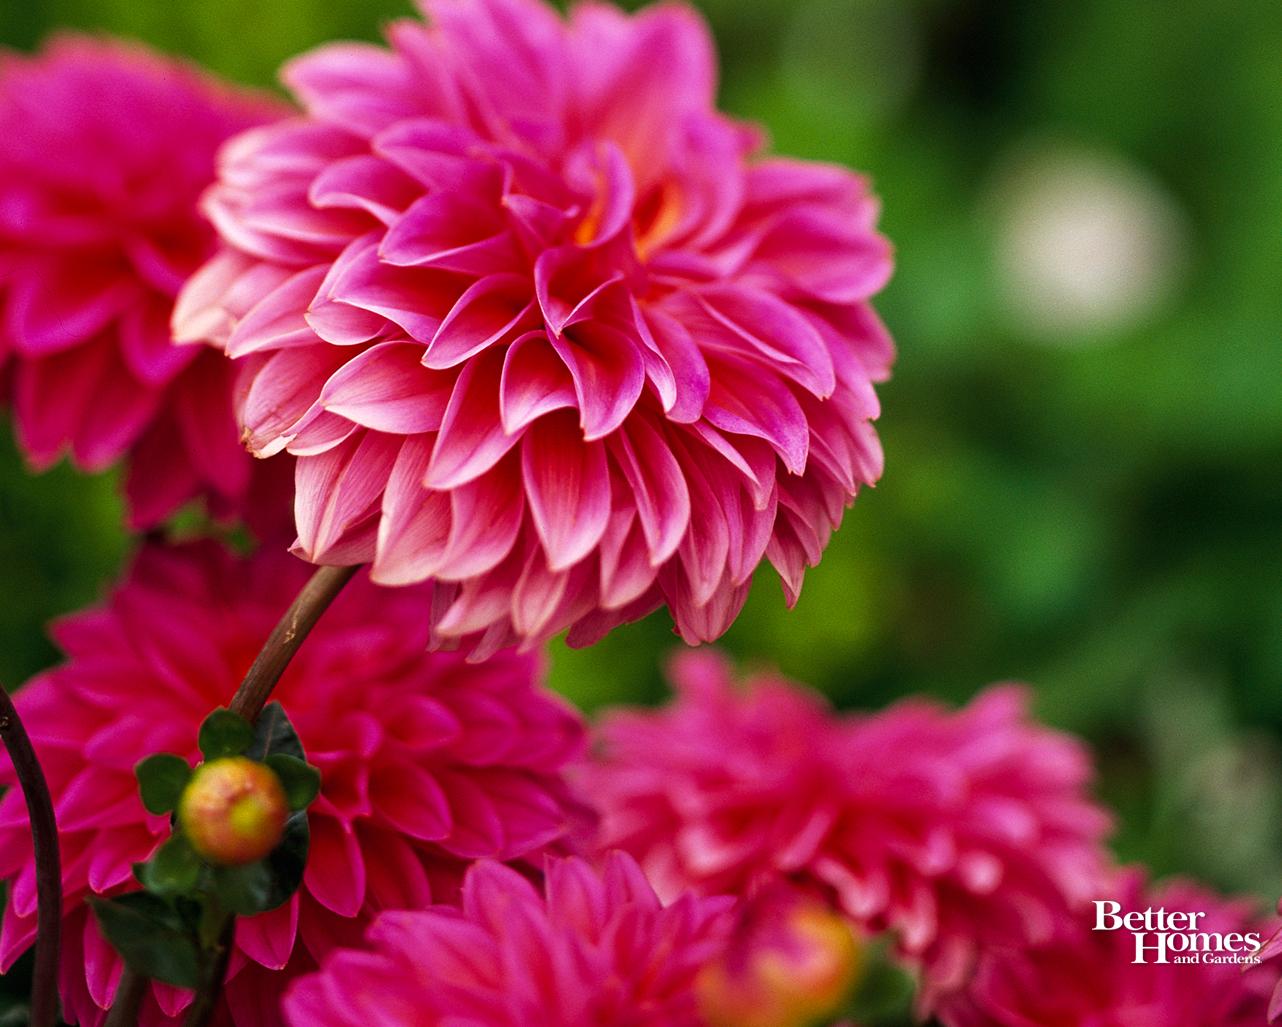 free spring desktop wallpaper,flower,flowering plant,petal,plant,pink